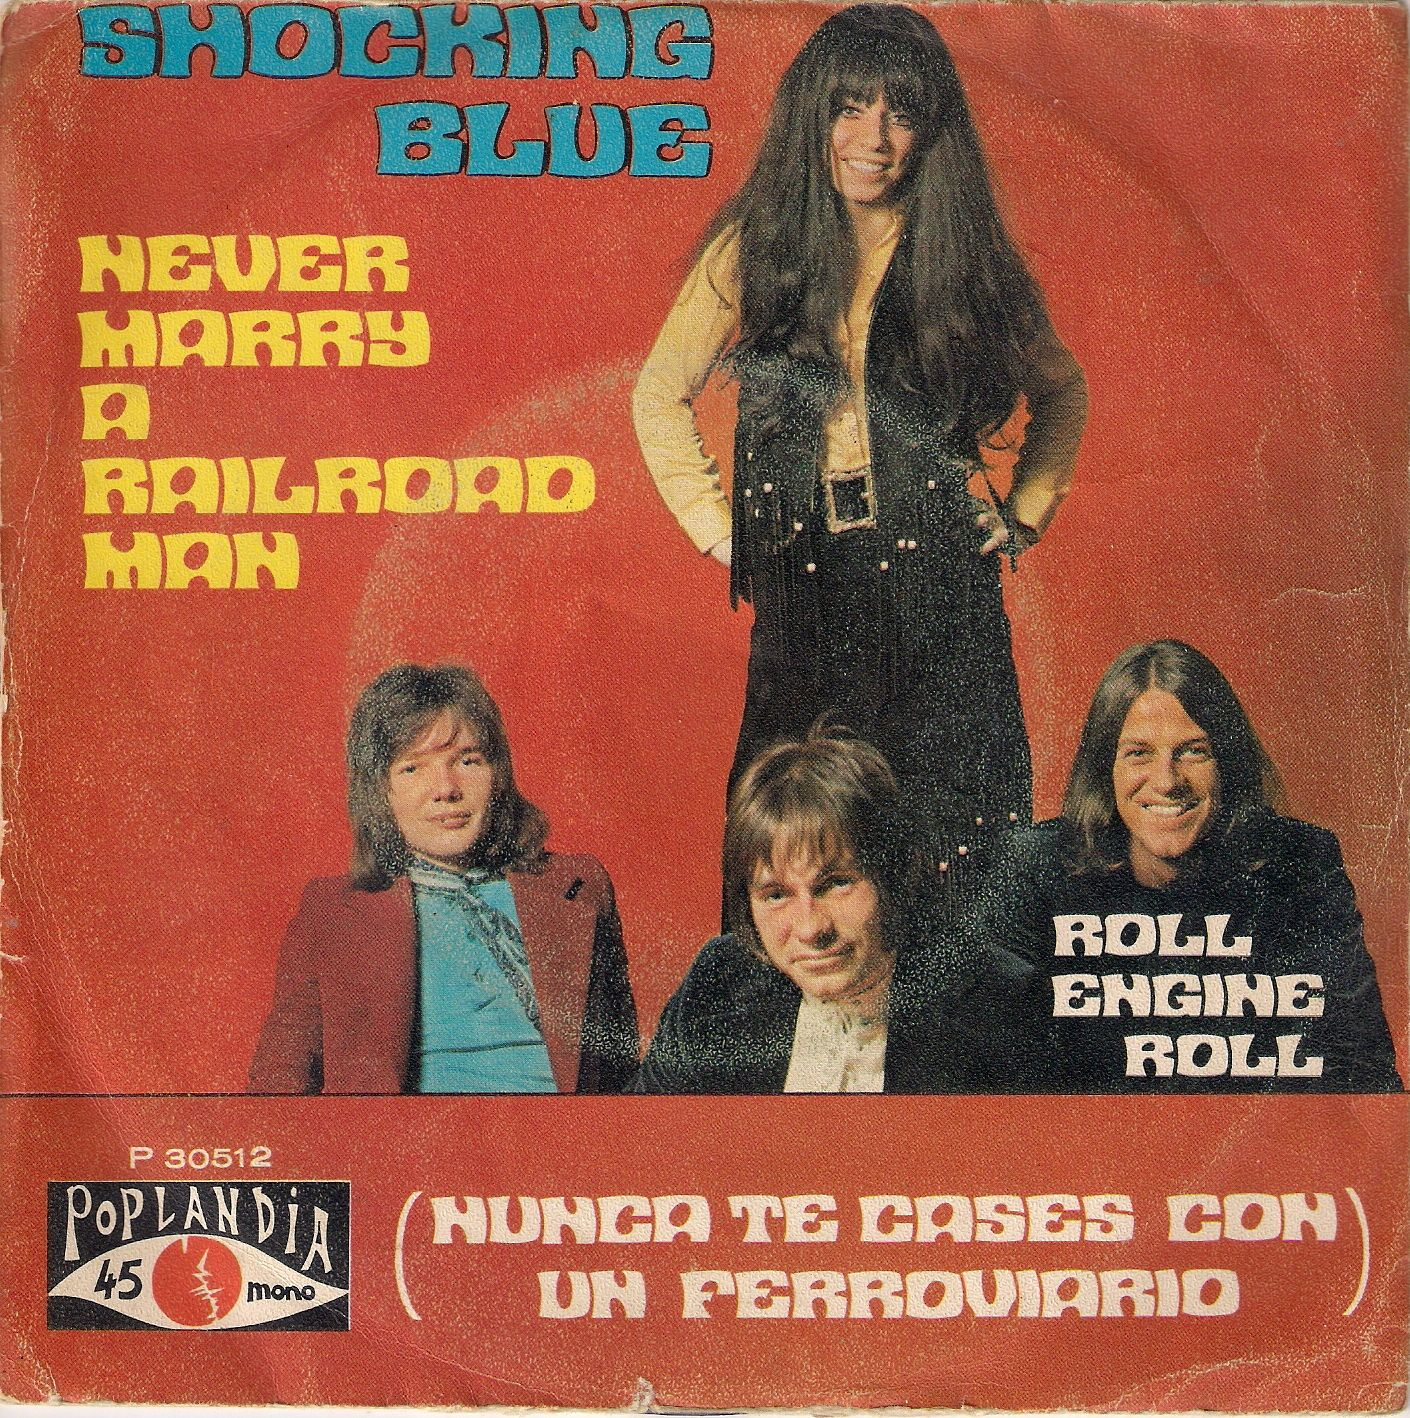 Shocking Blue 1970 Vinylplaten Jaren 60 Pop